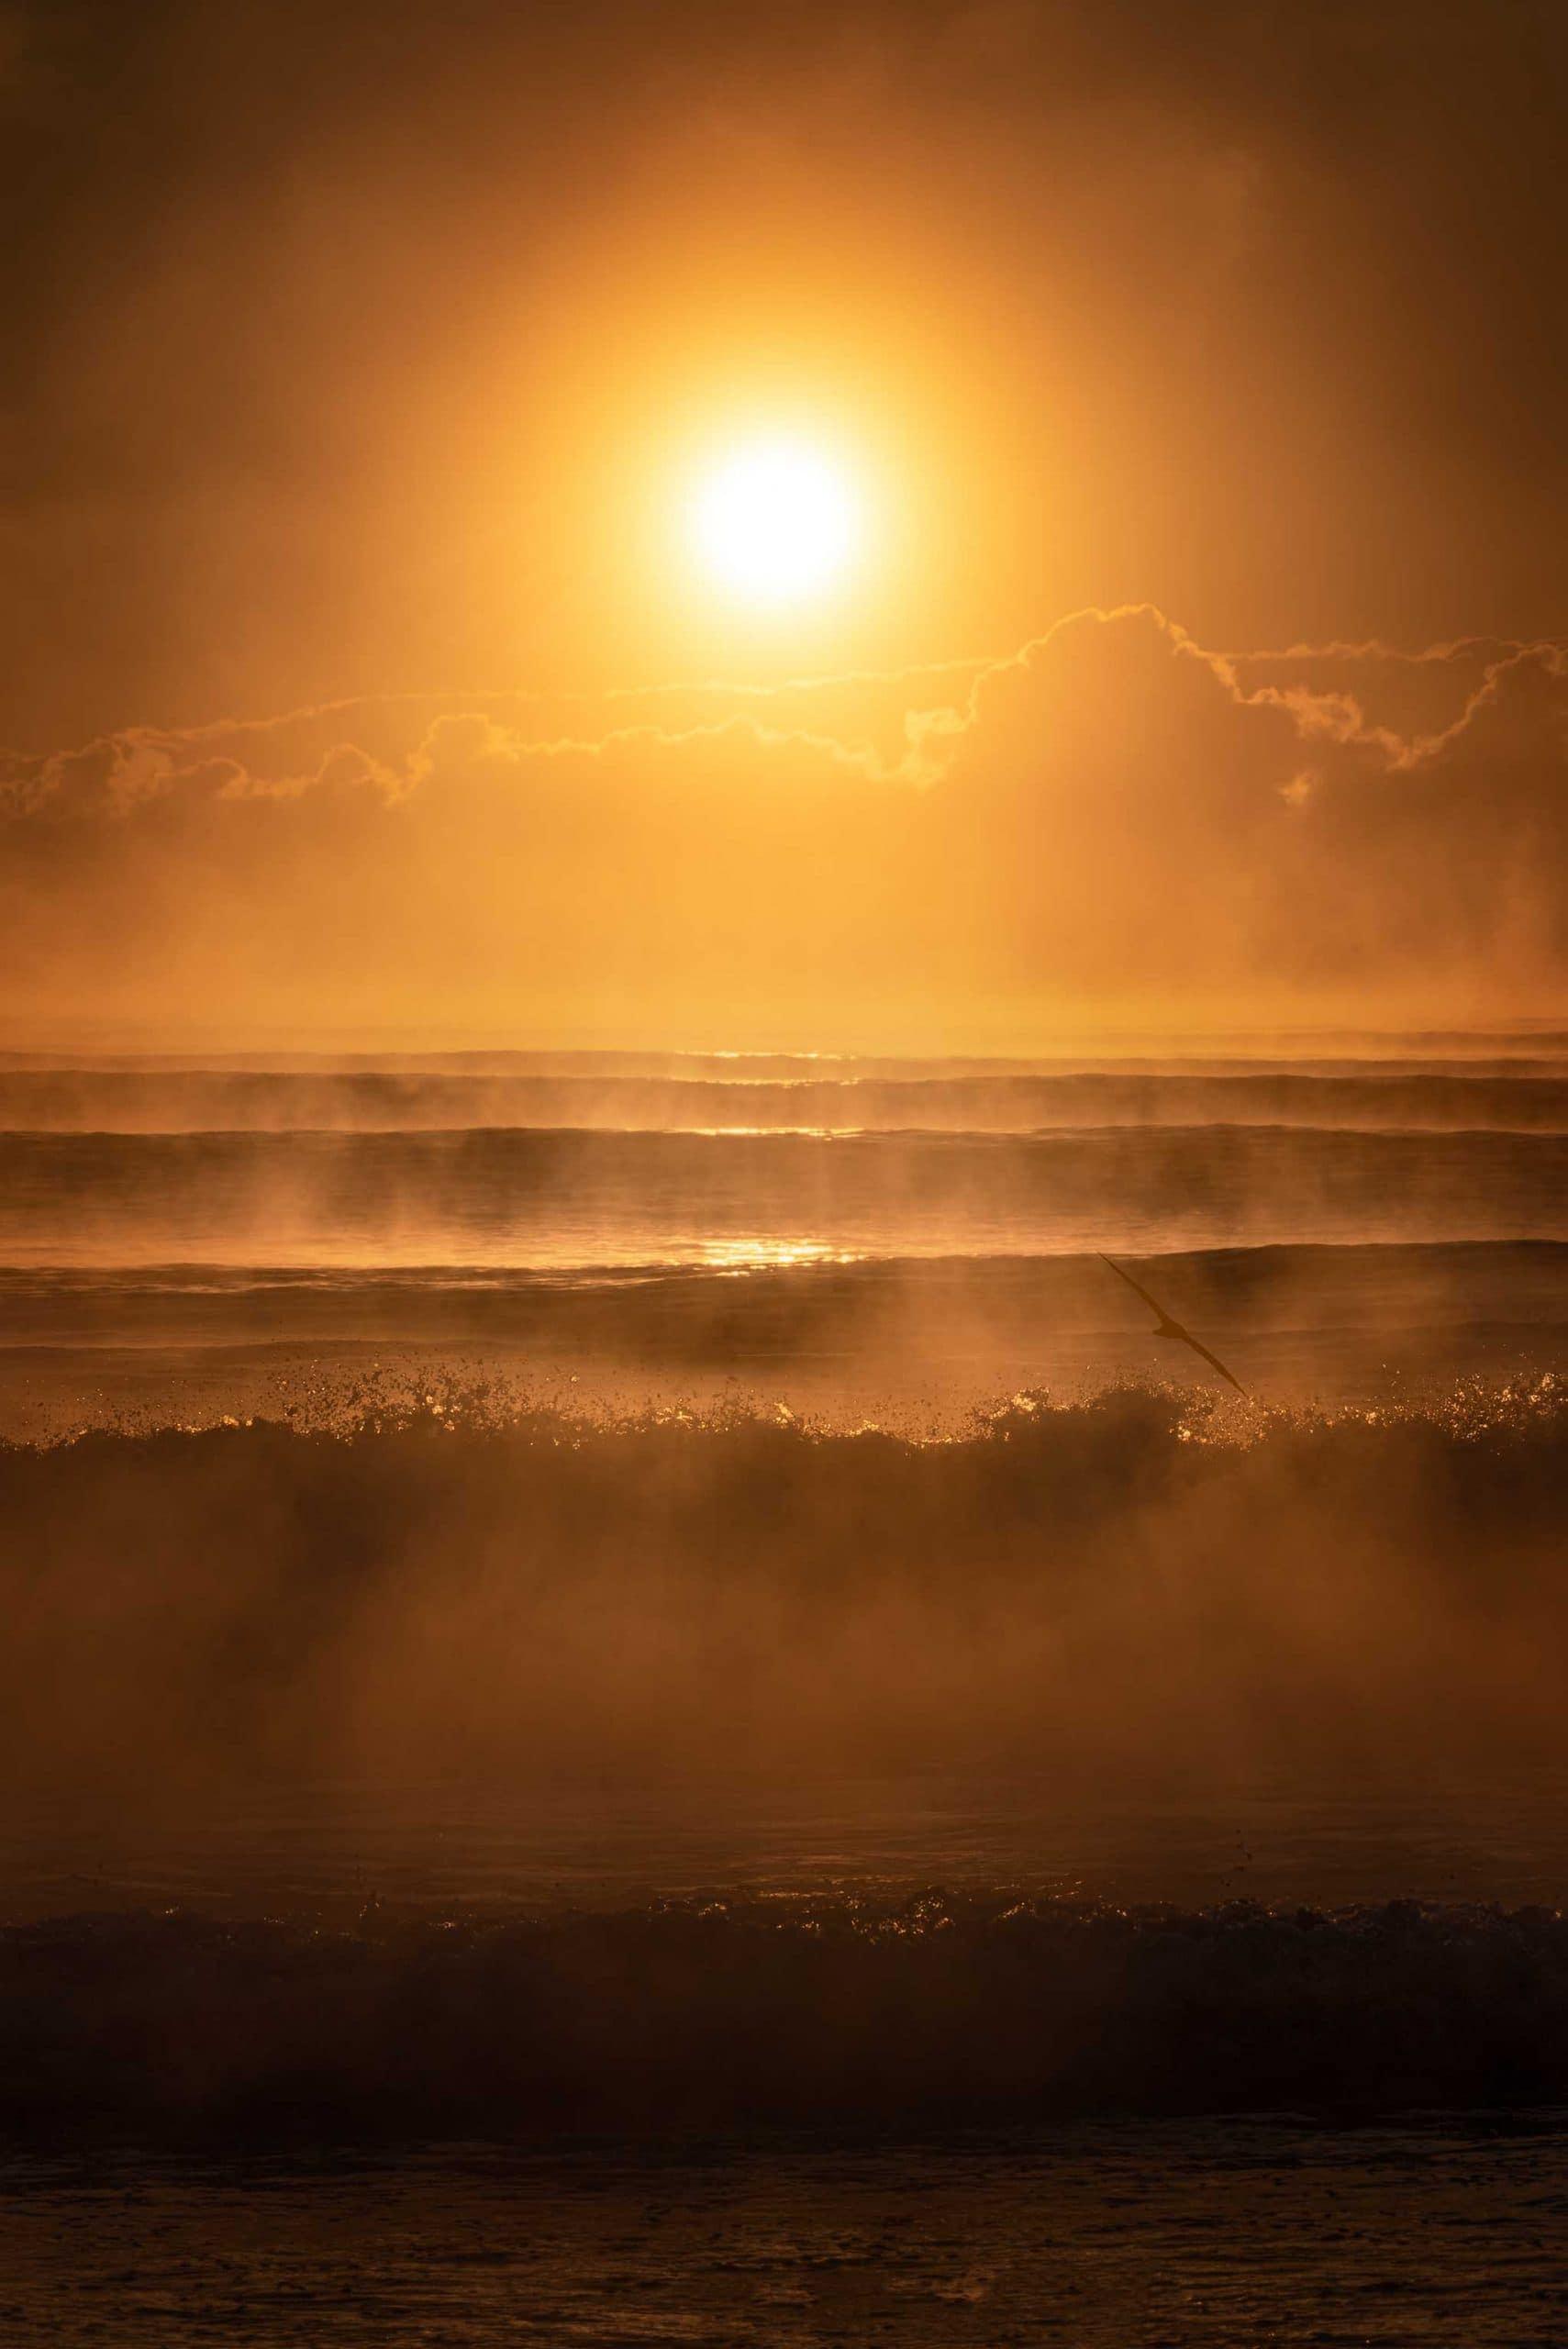 ocean fire dalegphoto